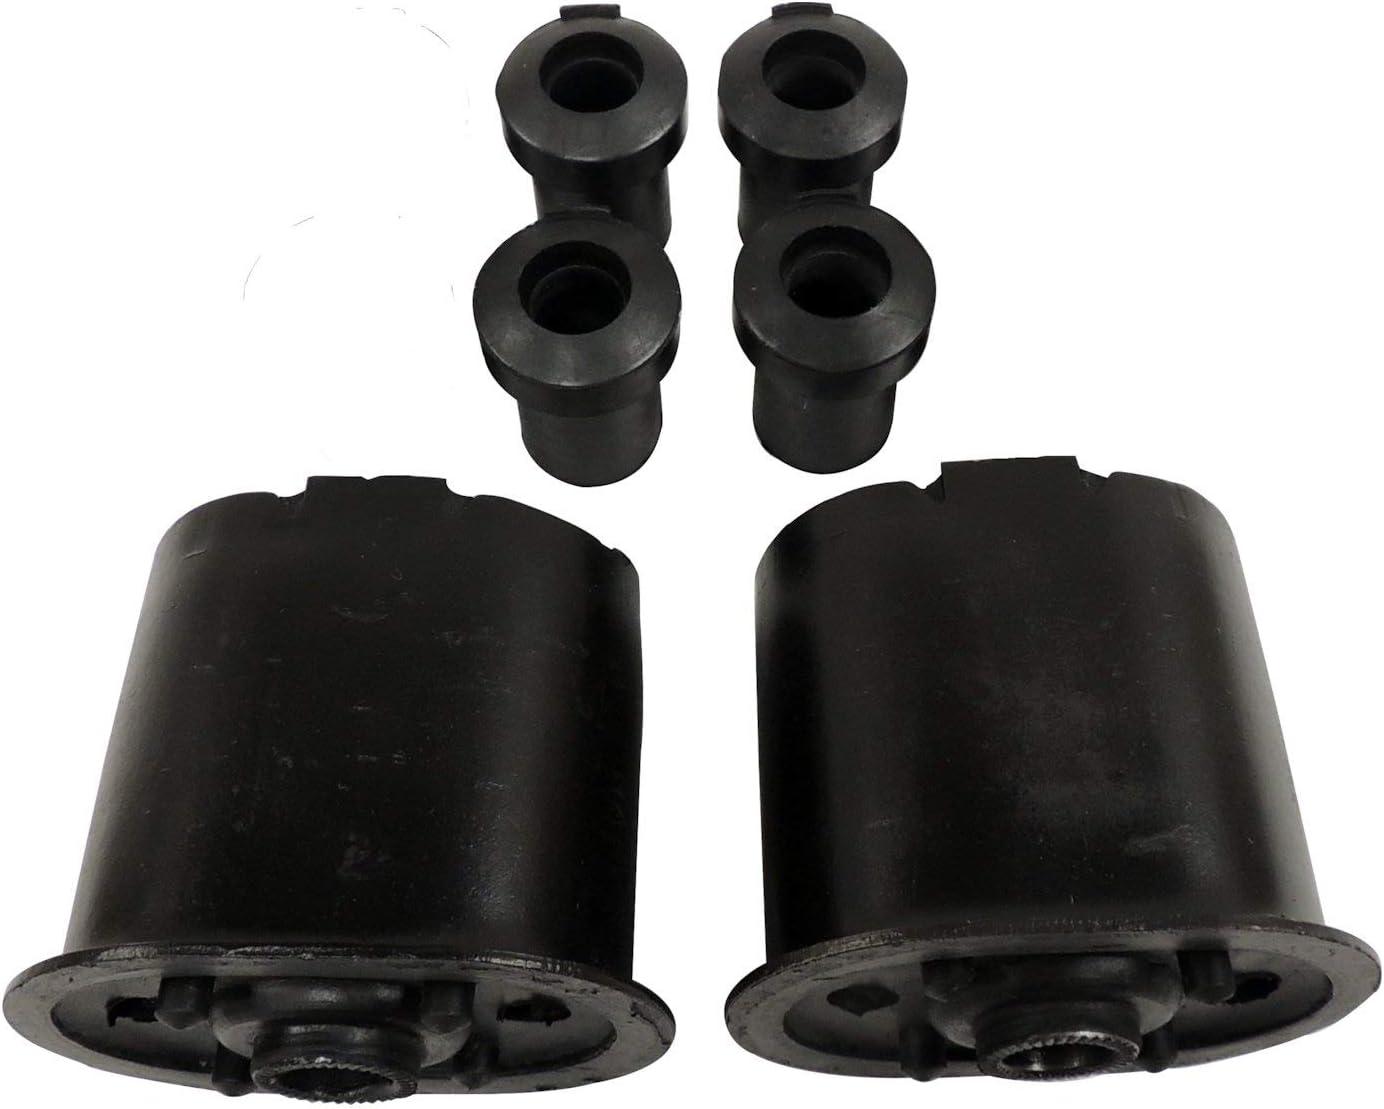 Crown Automotive-5006950K Leaf Spring Kit Bushing shop Black High quality